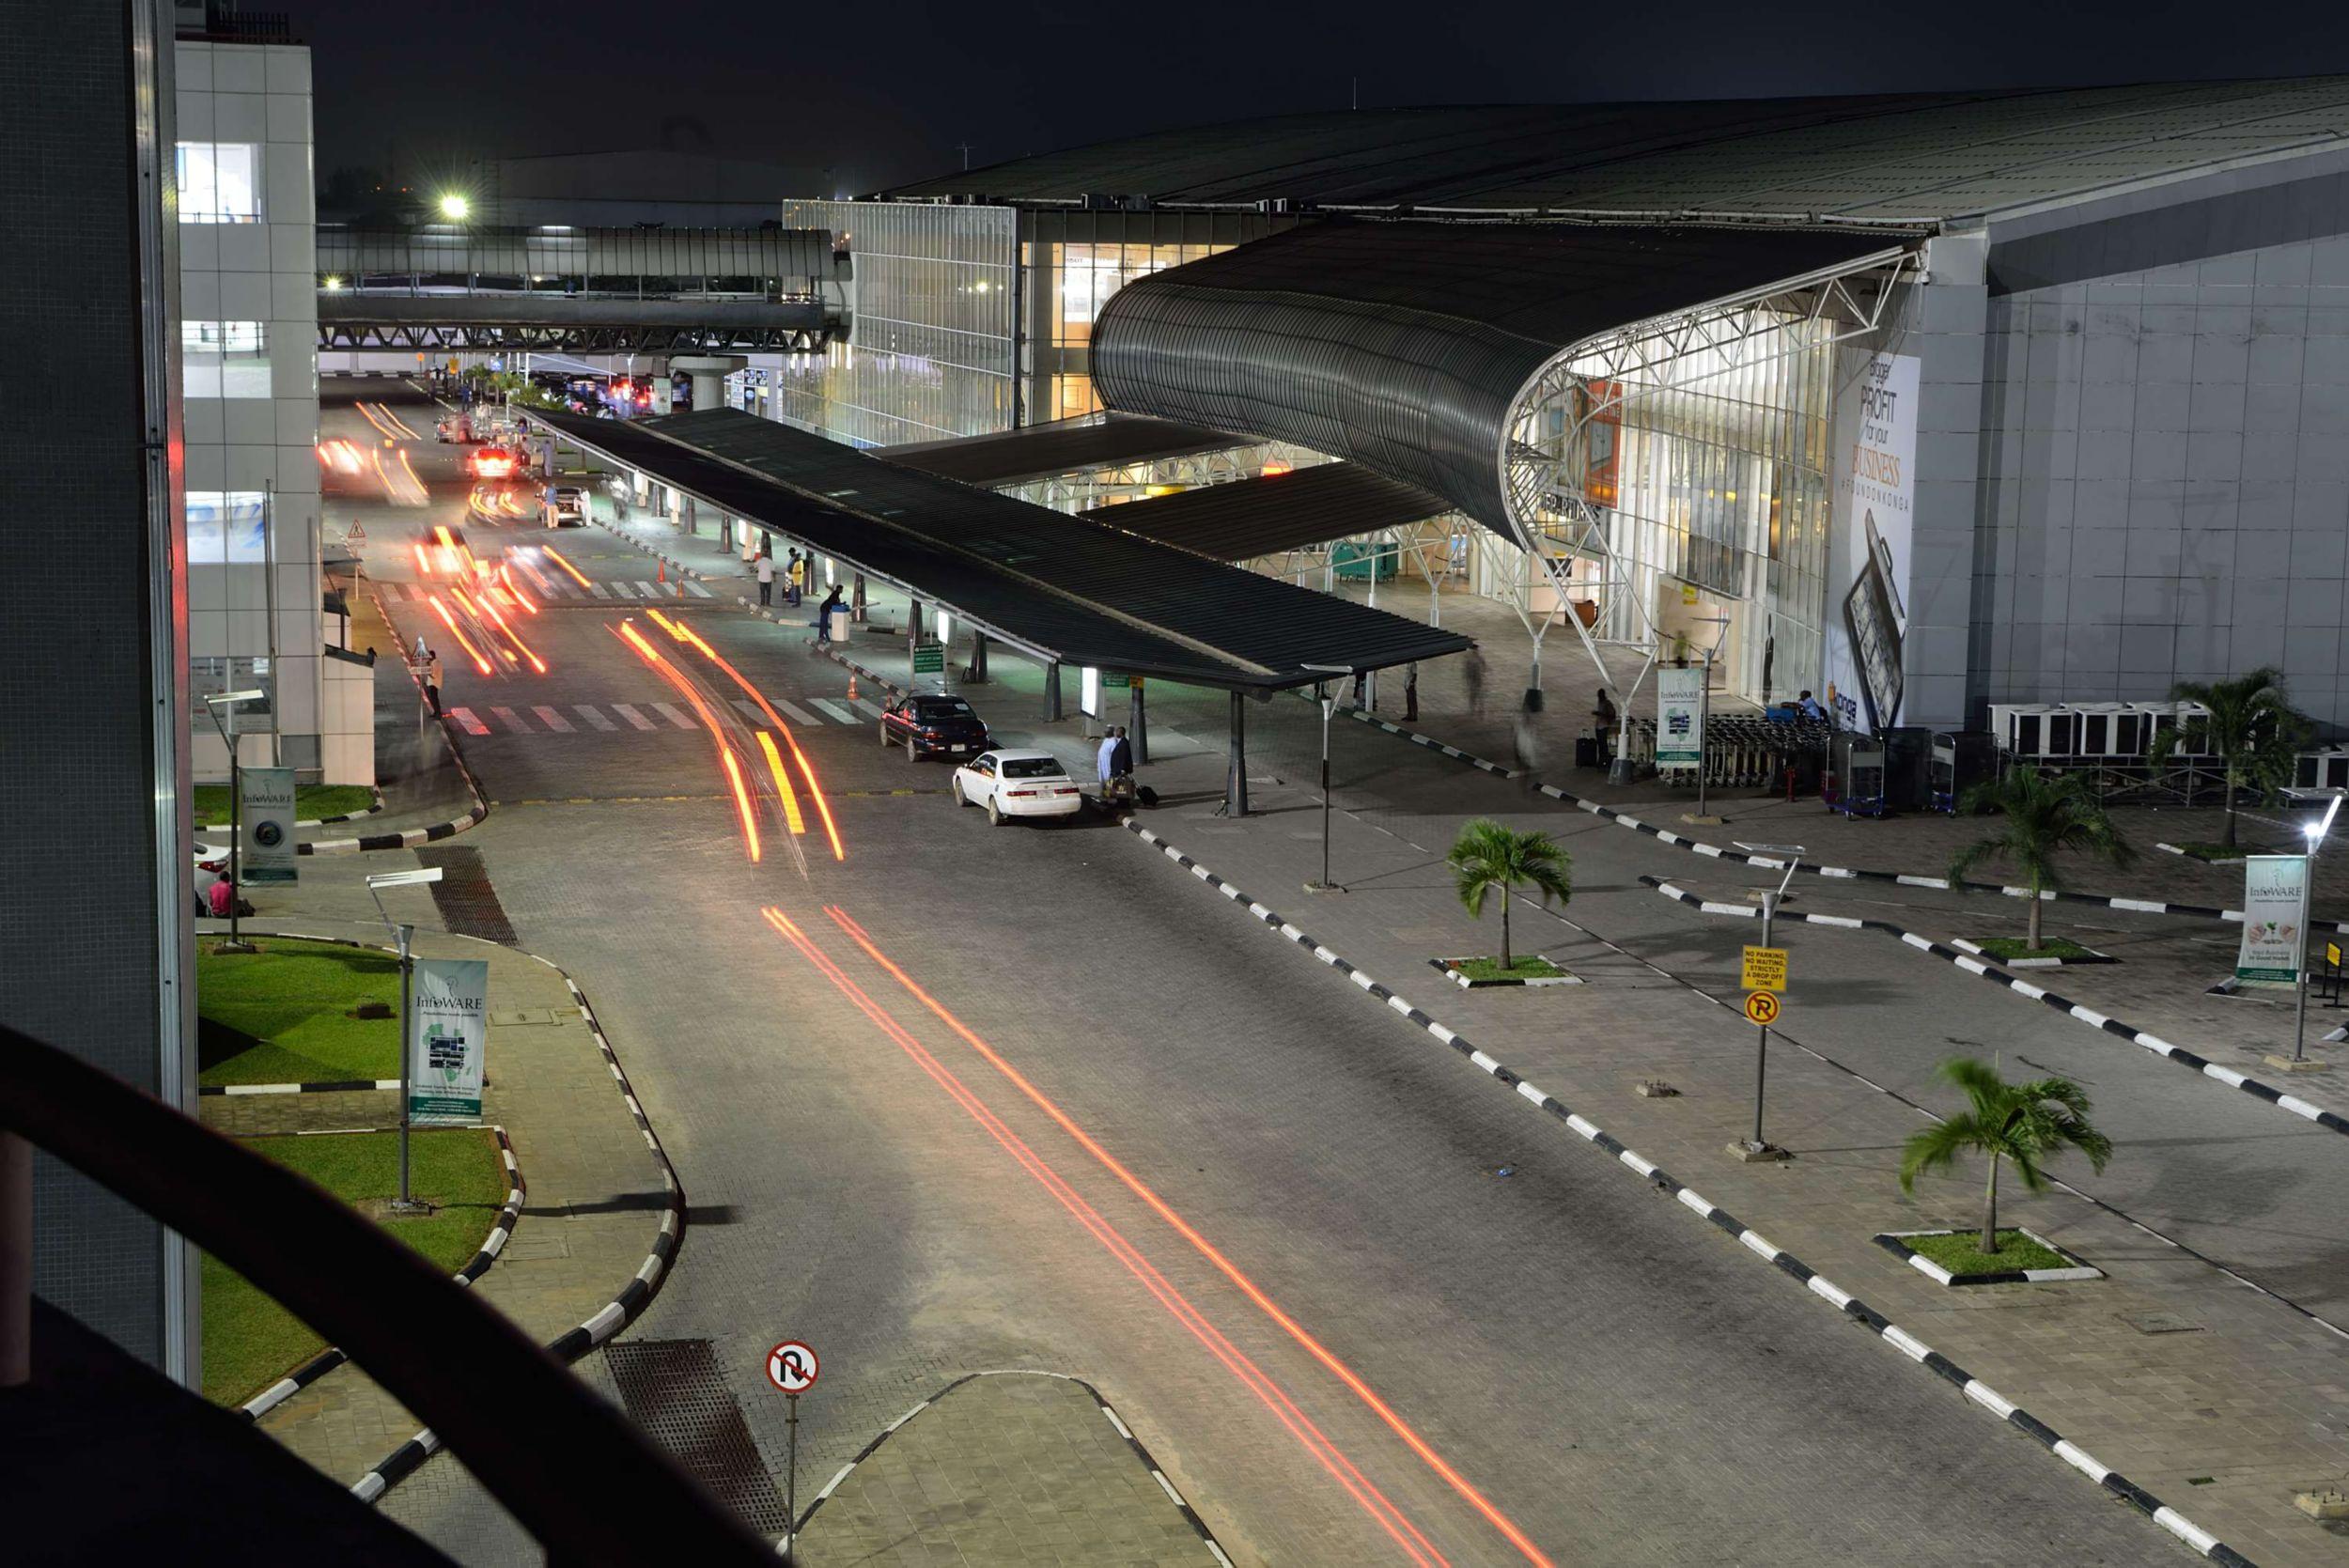 Murtala Muhammed International Airport in Lagos, Nigeria